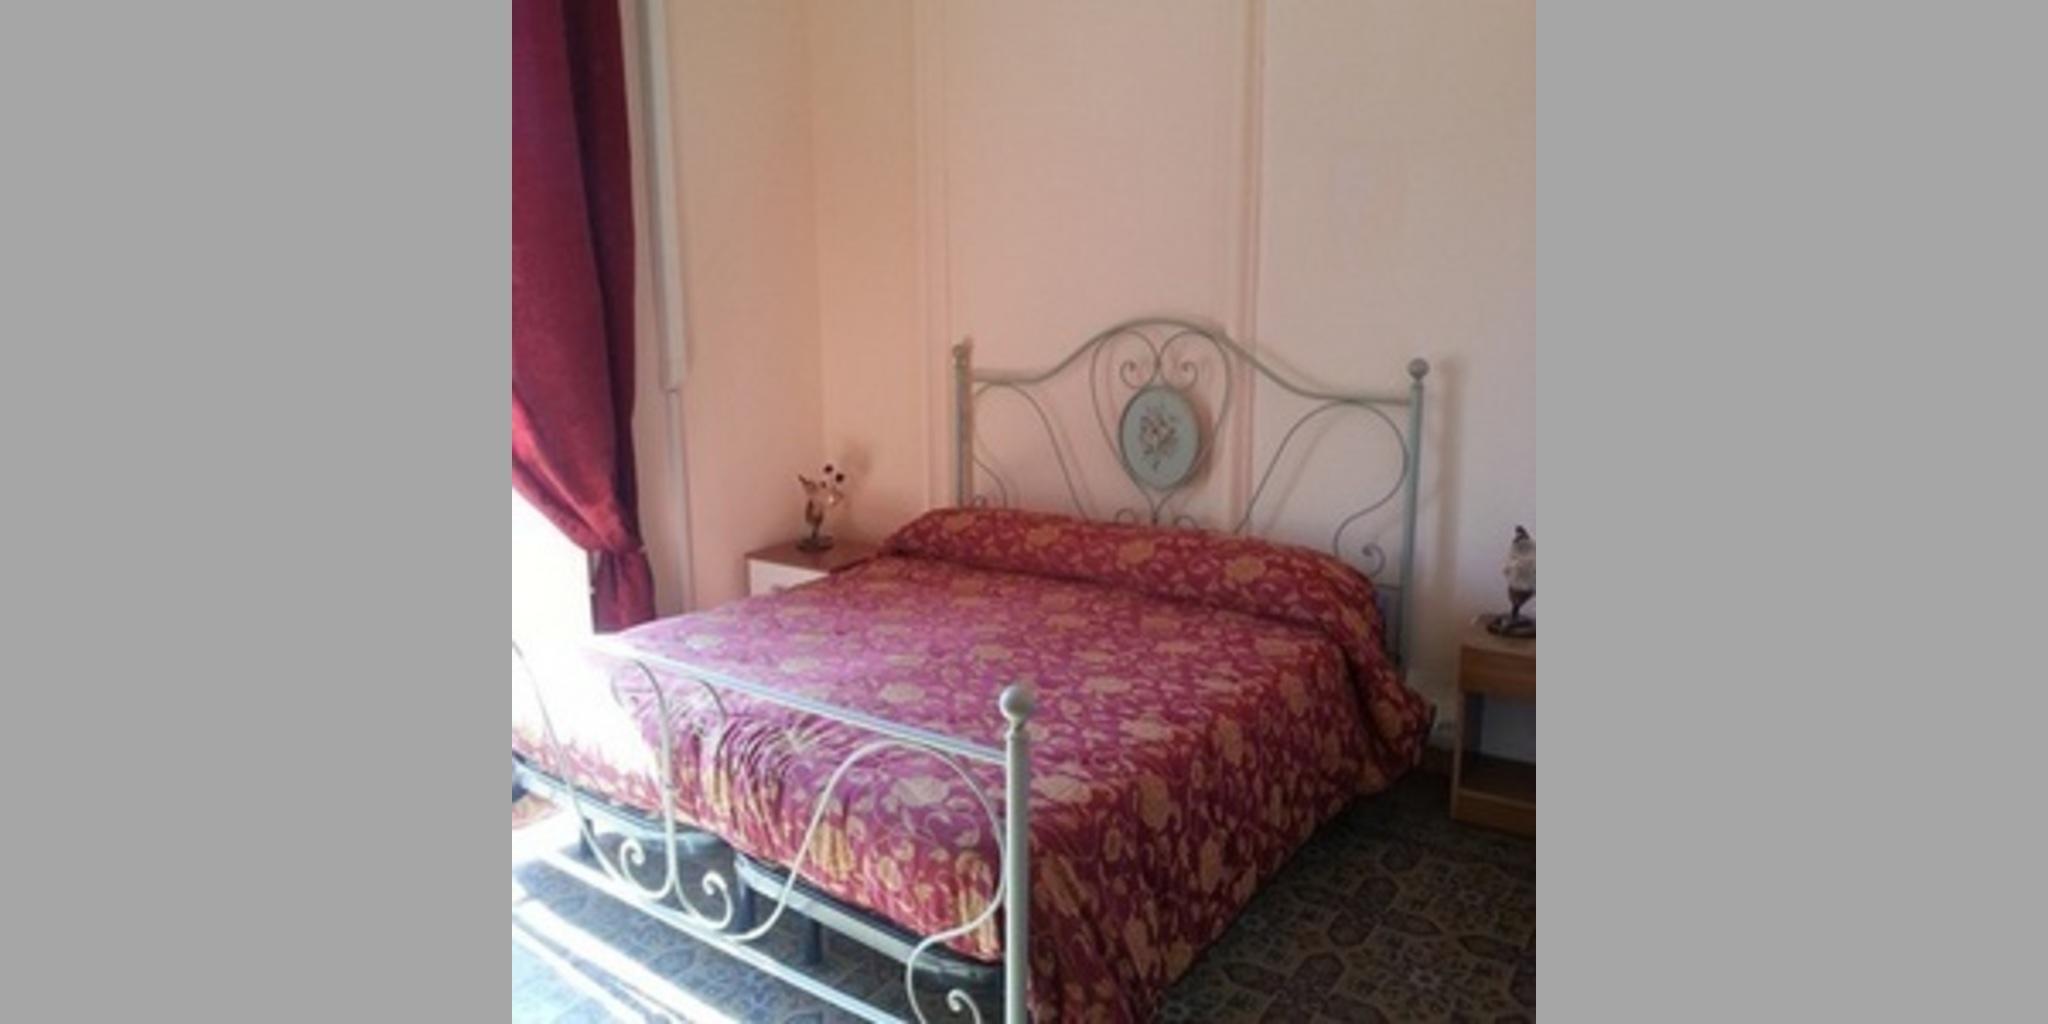 Bed & Breakfast Catania - Catania_Piazza Duomo